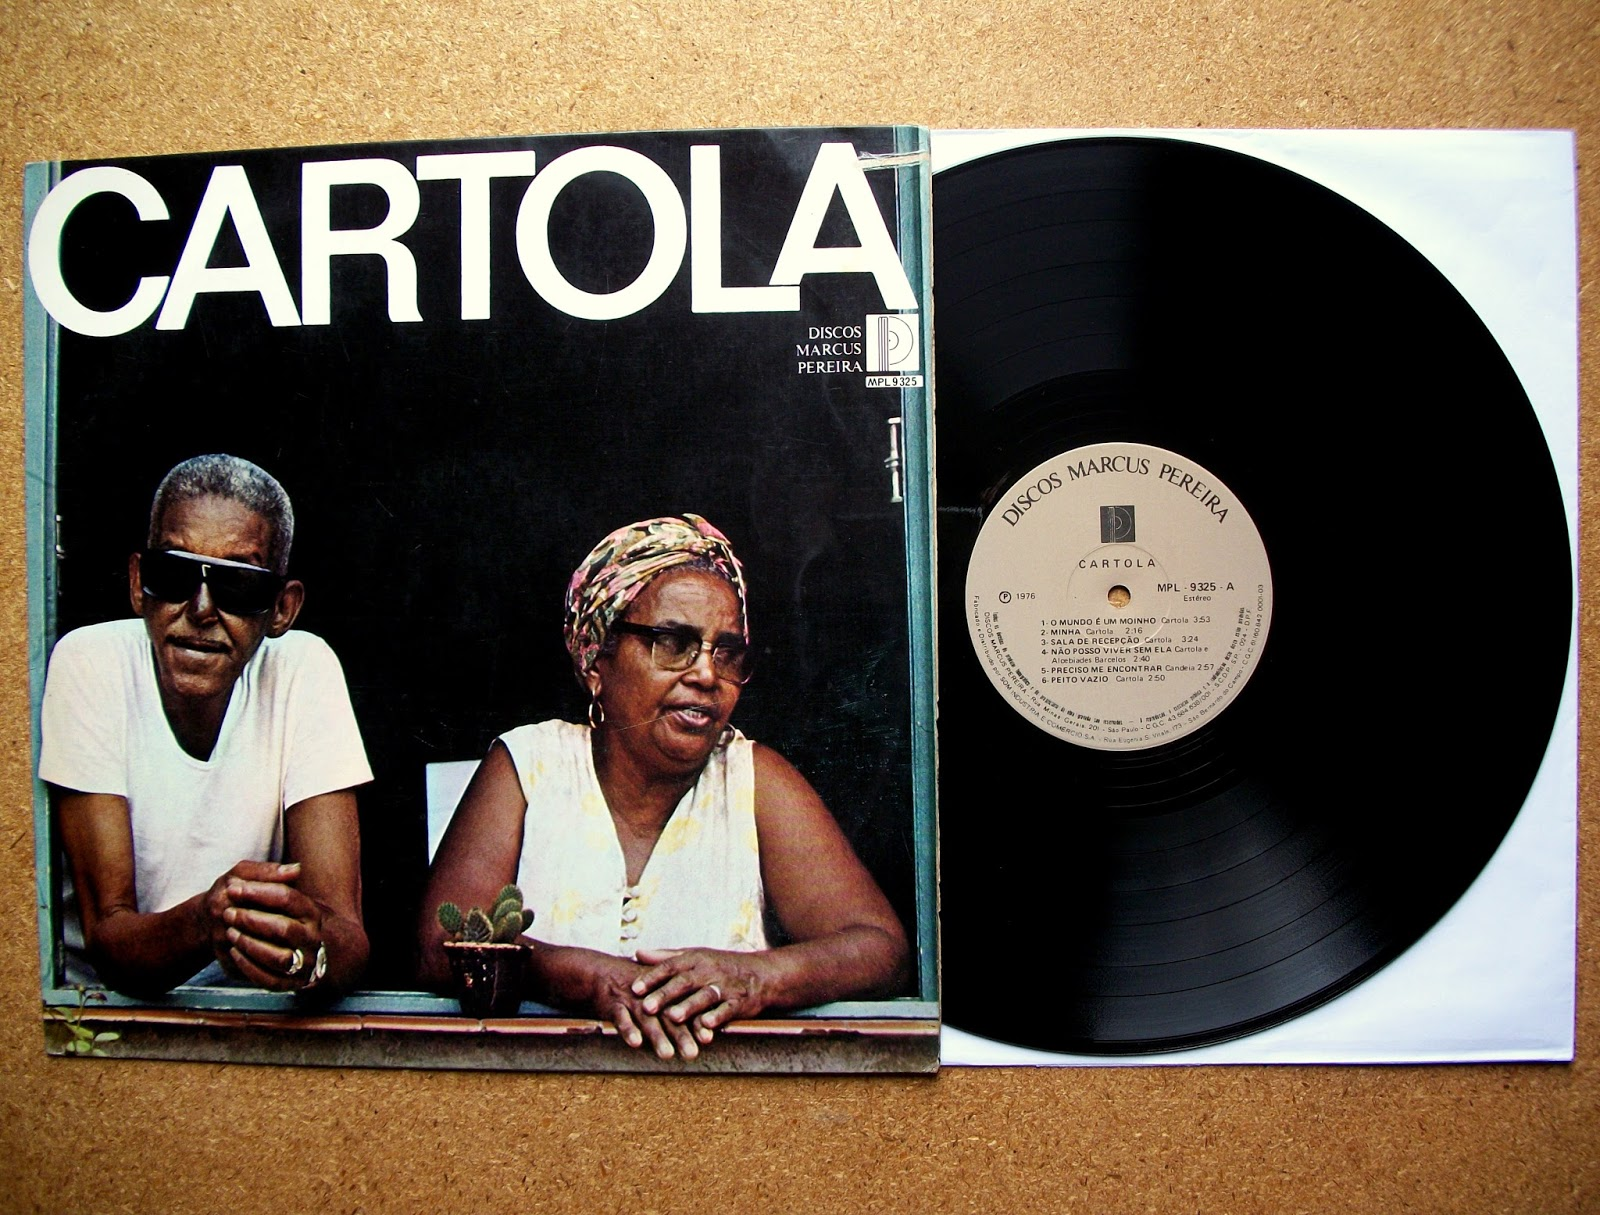 CD CARTOLA BAIXAR MP3